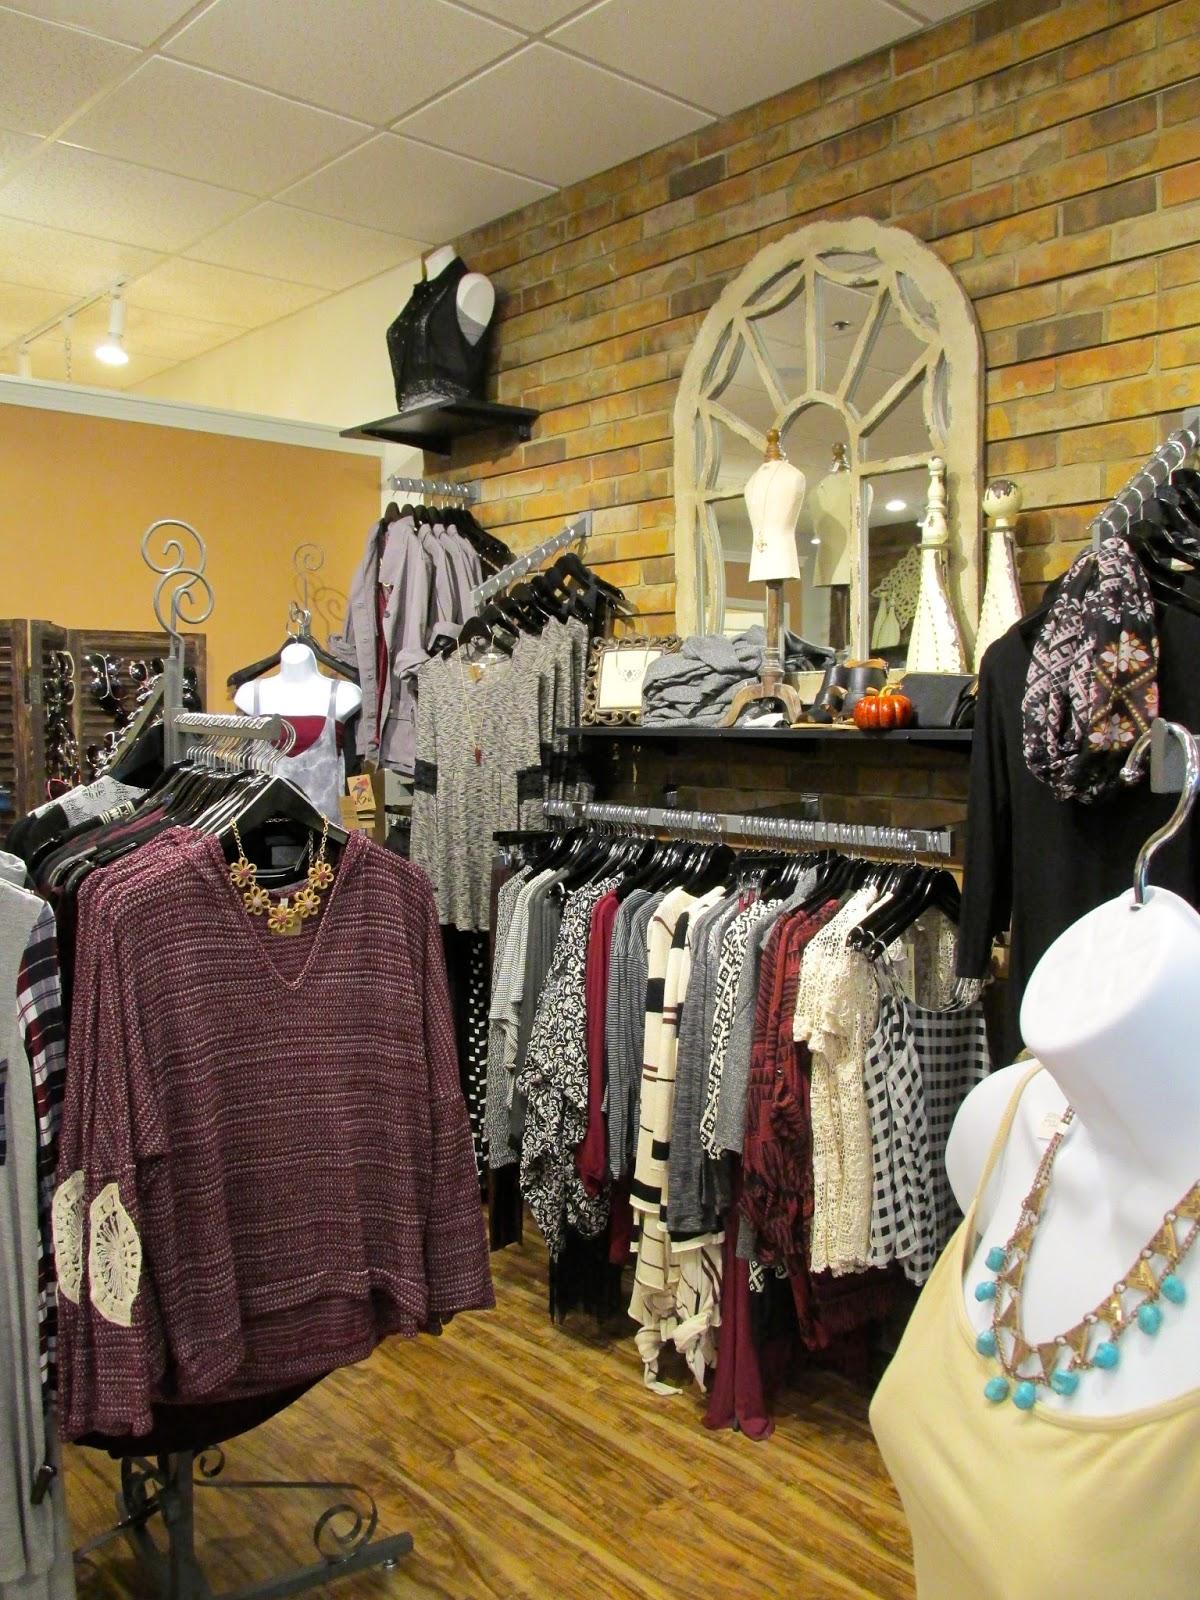 Apricot Lane Boutique in Jacksonville